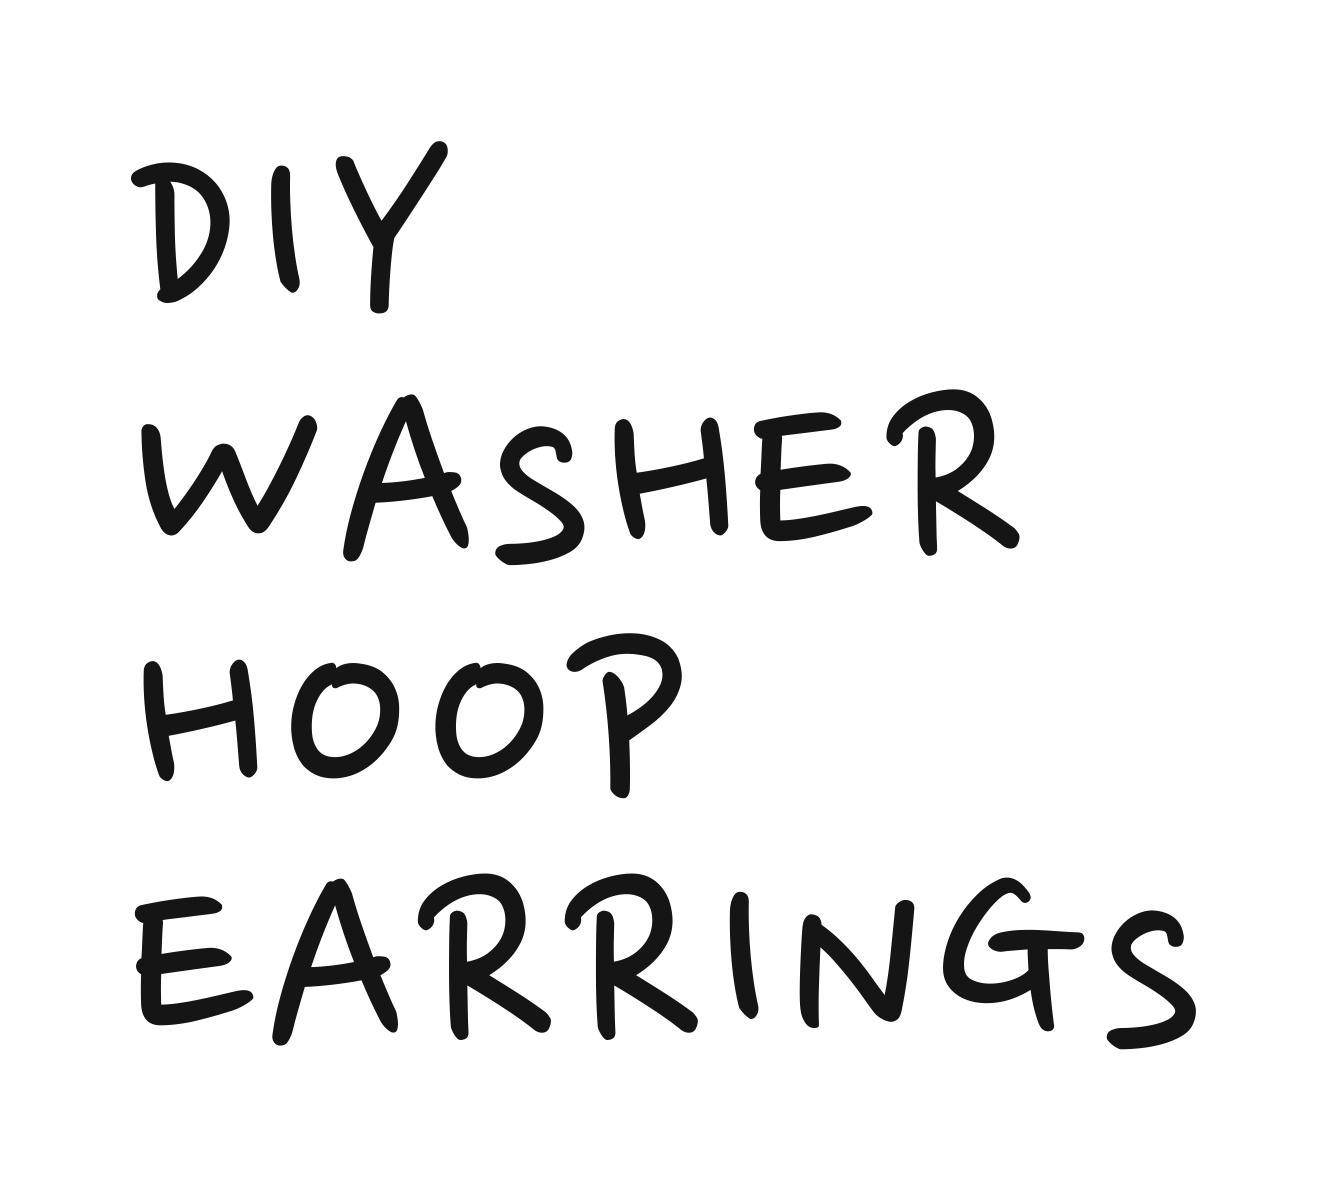 WasherHoopEarringsBlock.png